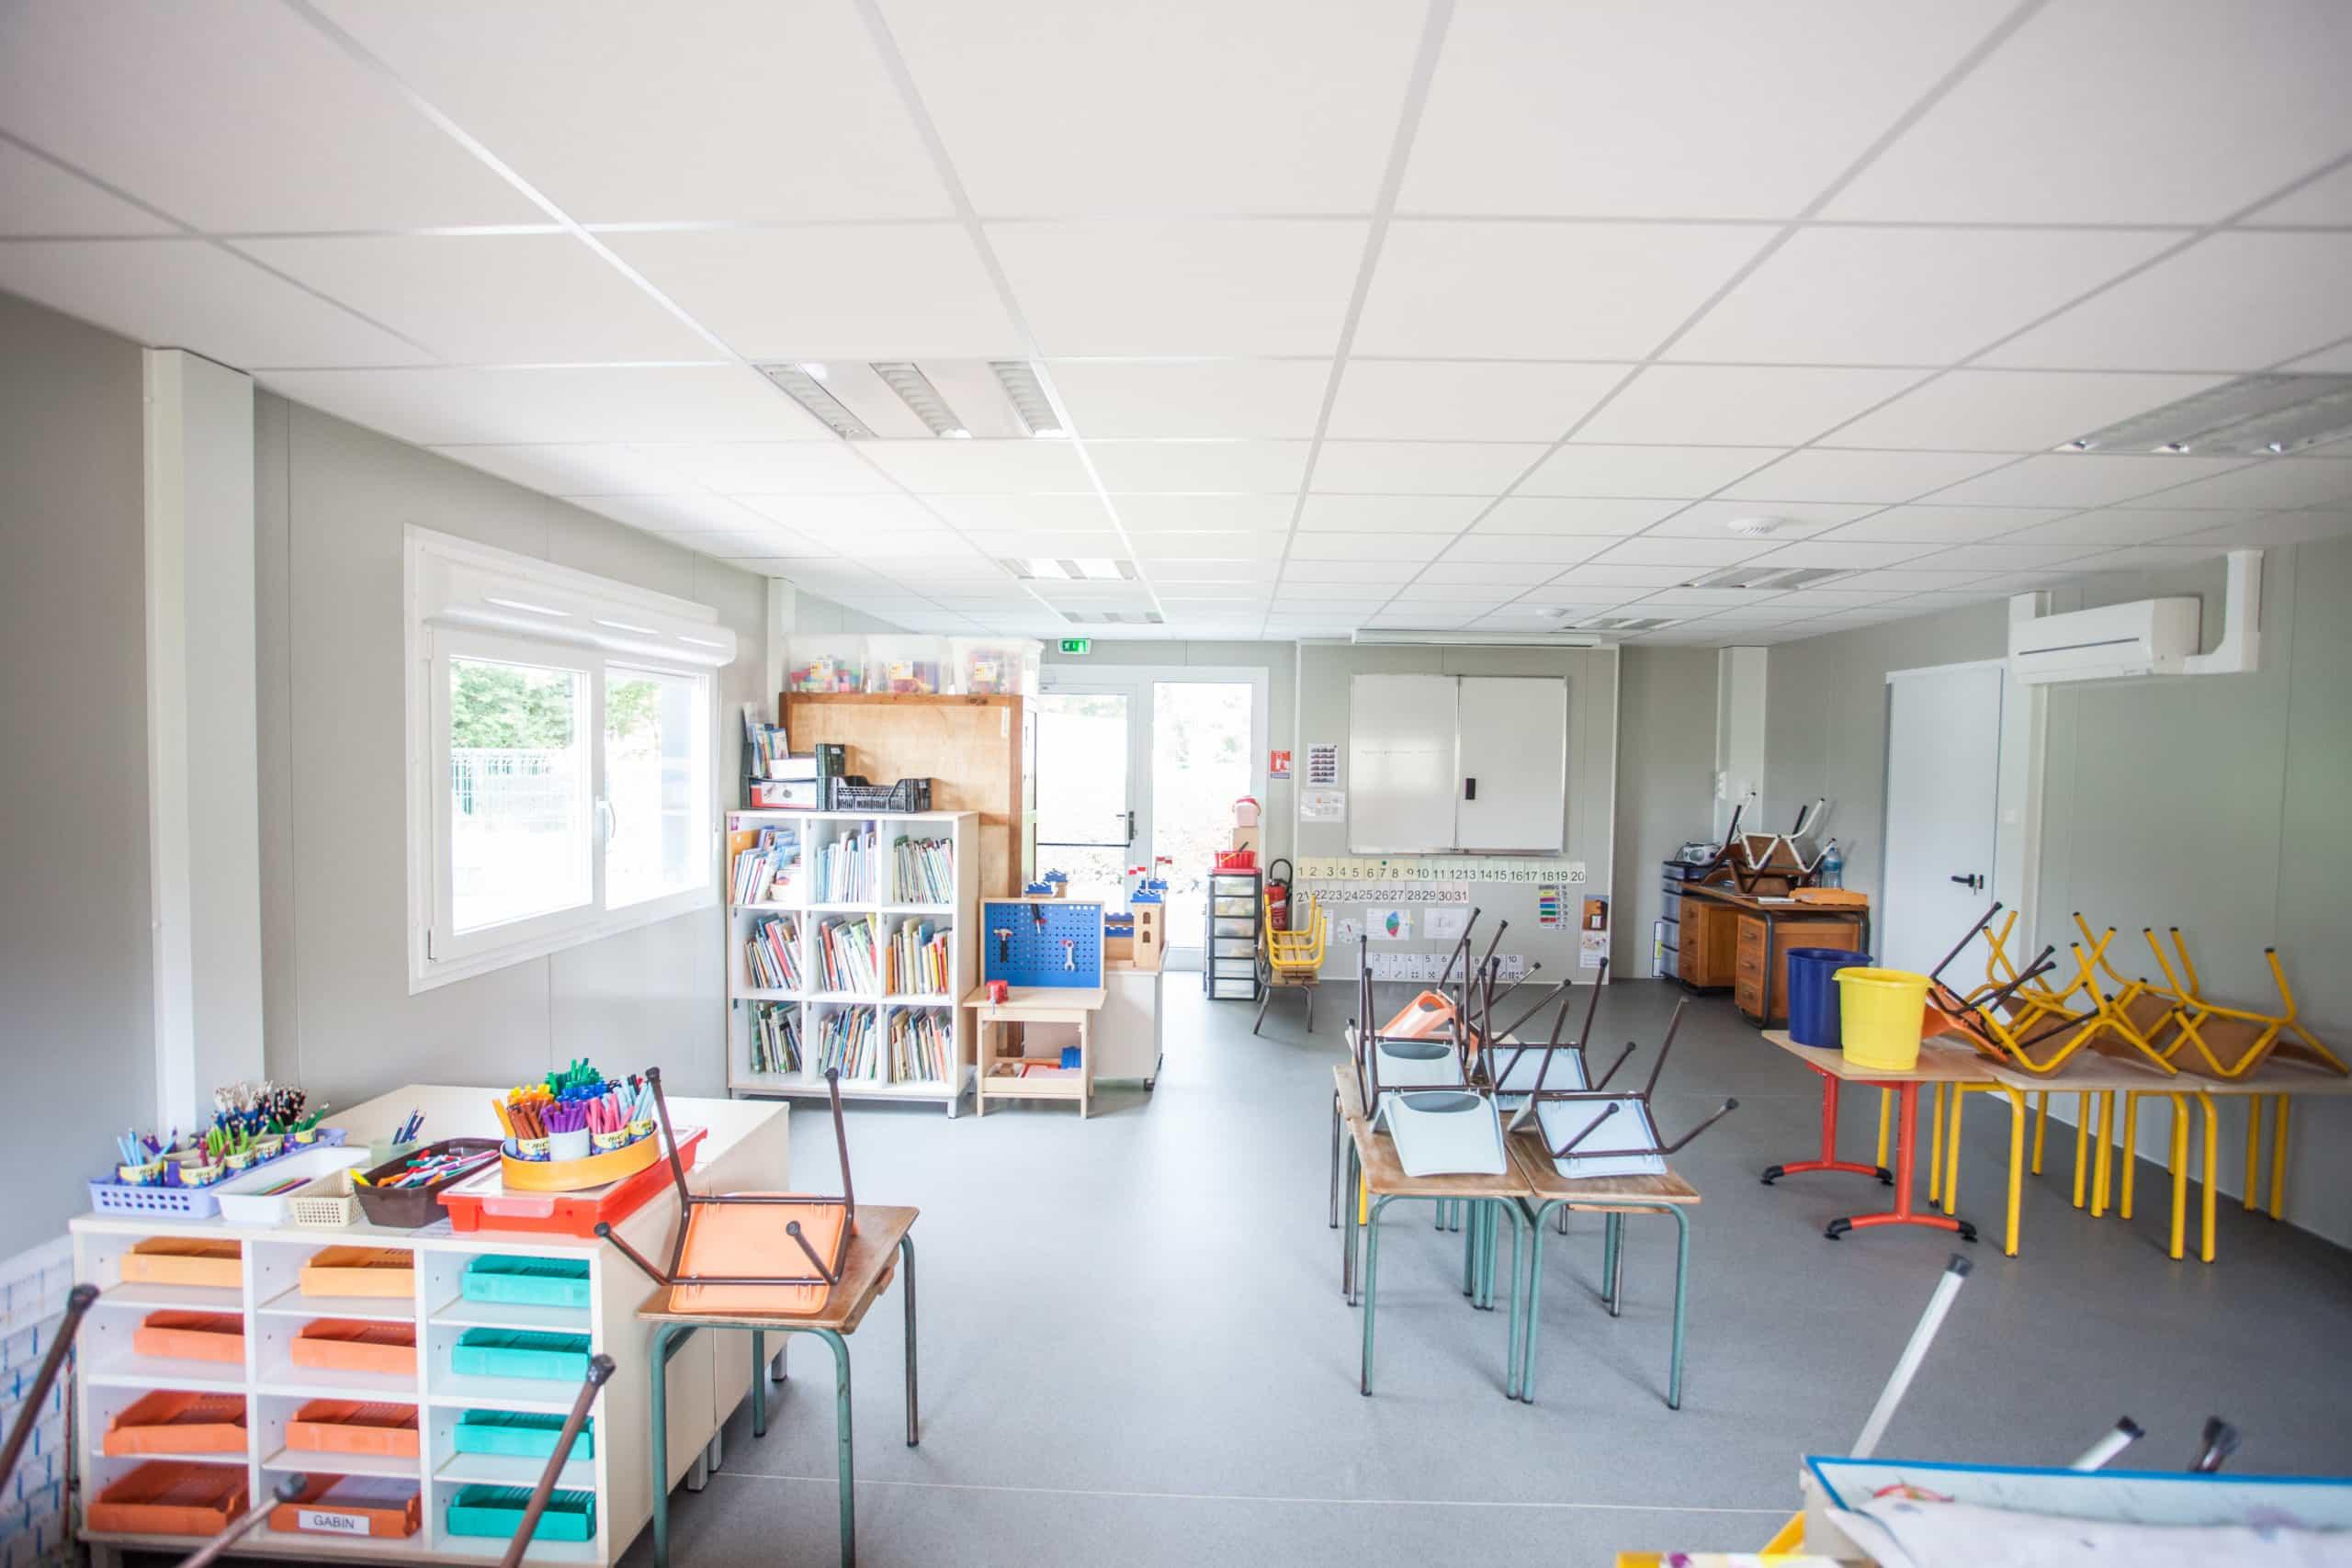 Salle De Classe Prefabriquee